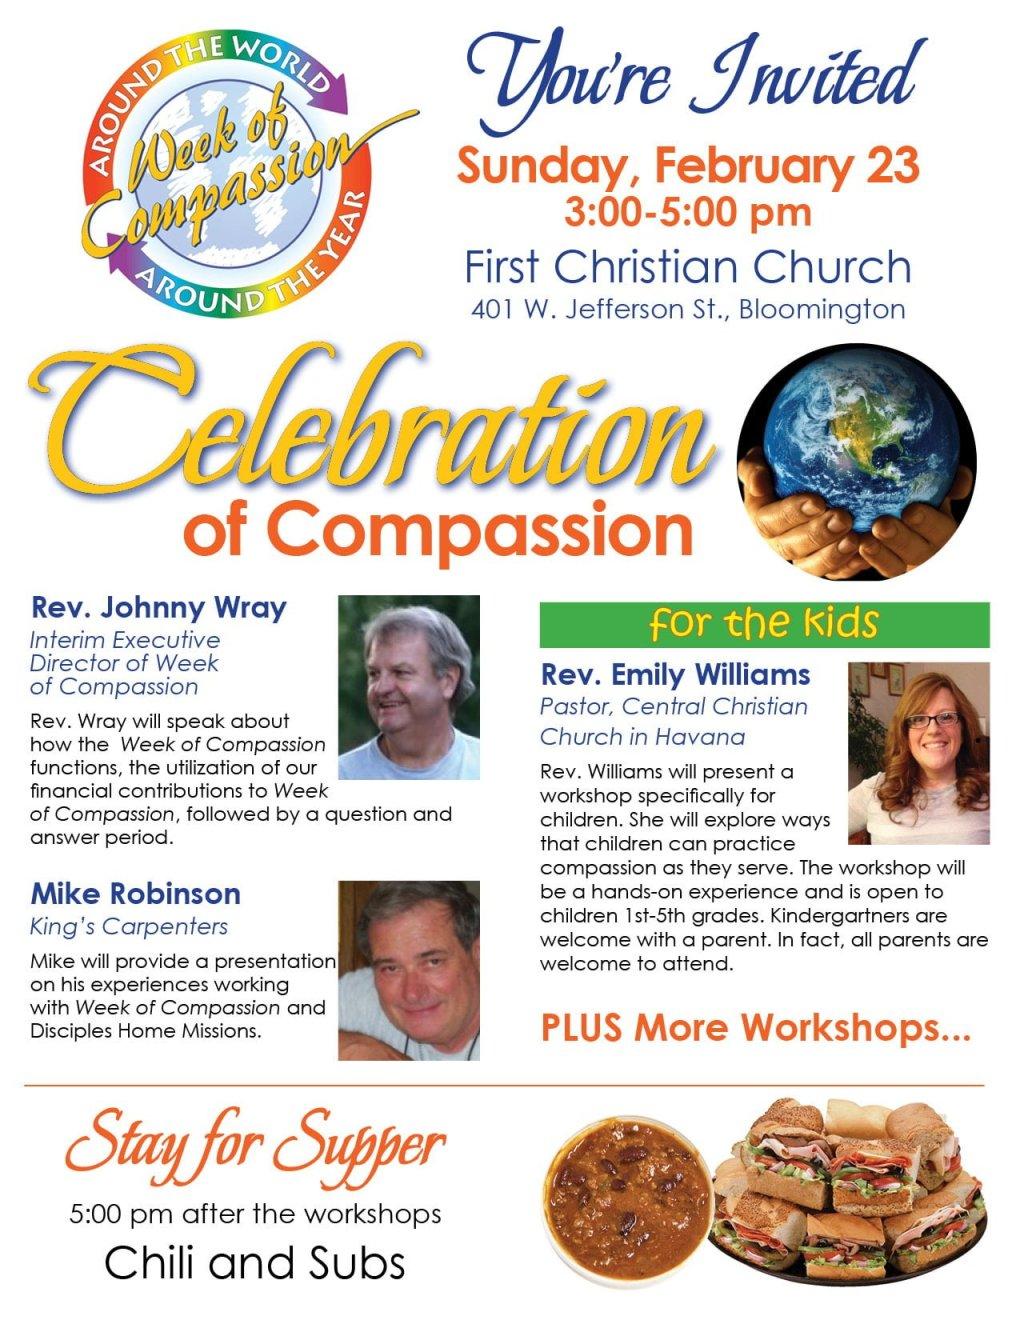 CelebrationofCompassion poster2014 (3)